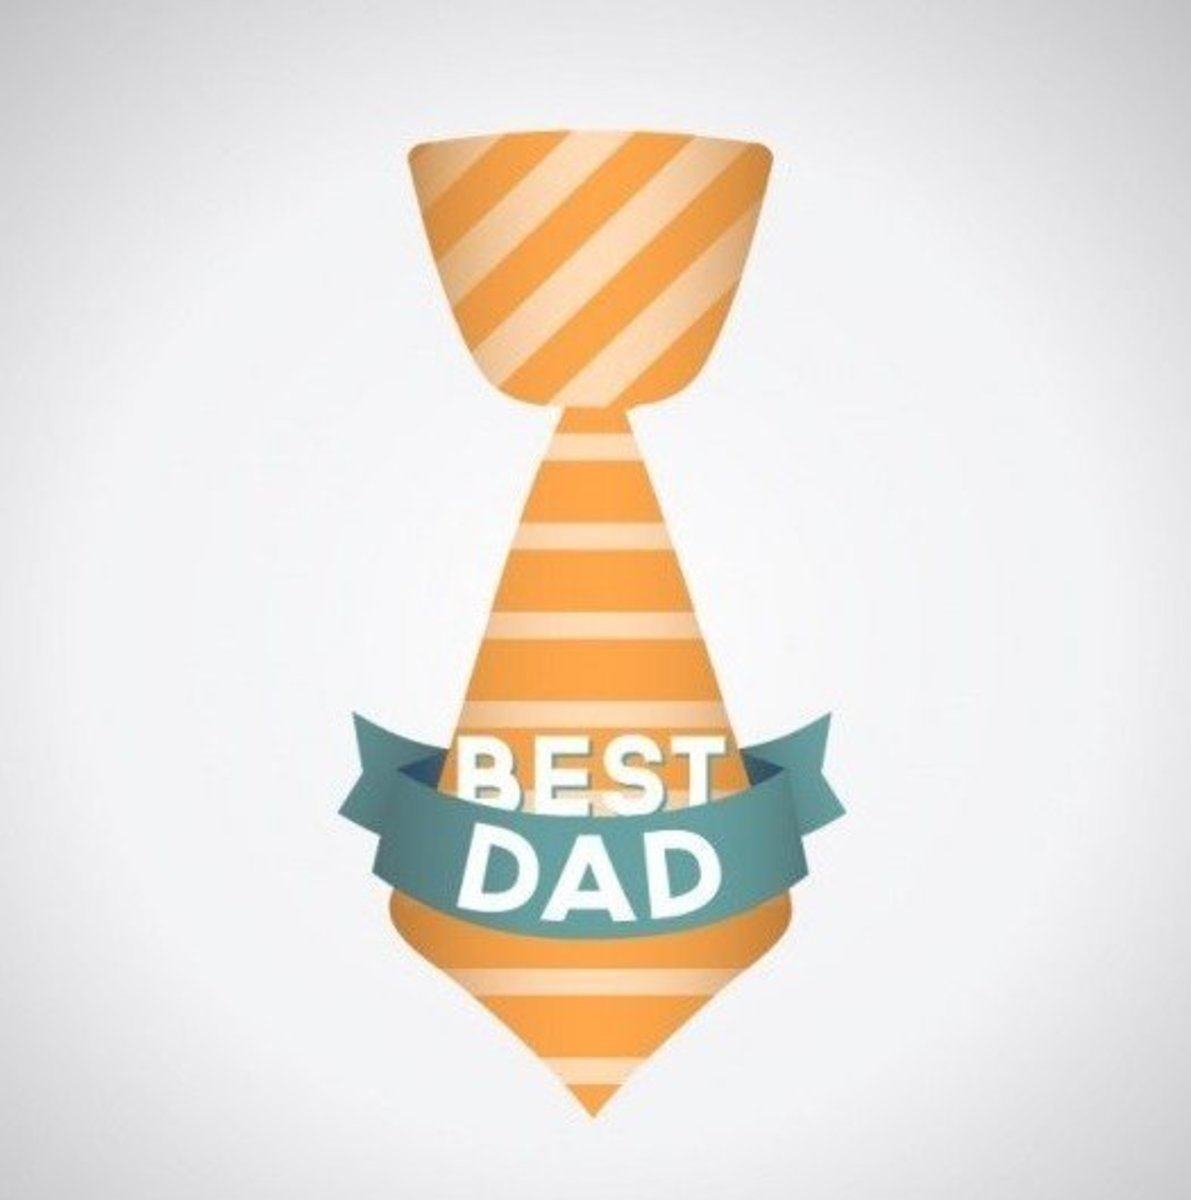 'Best Dad' on a Tie